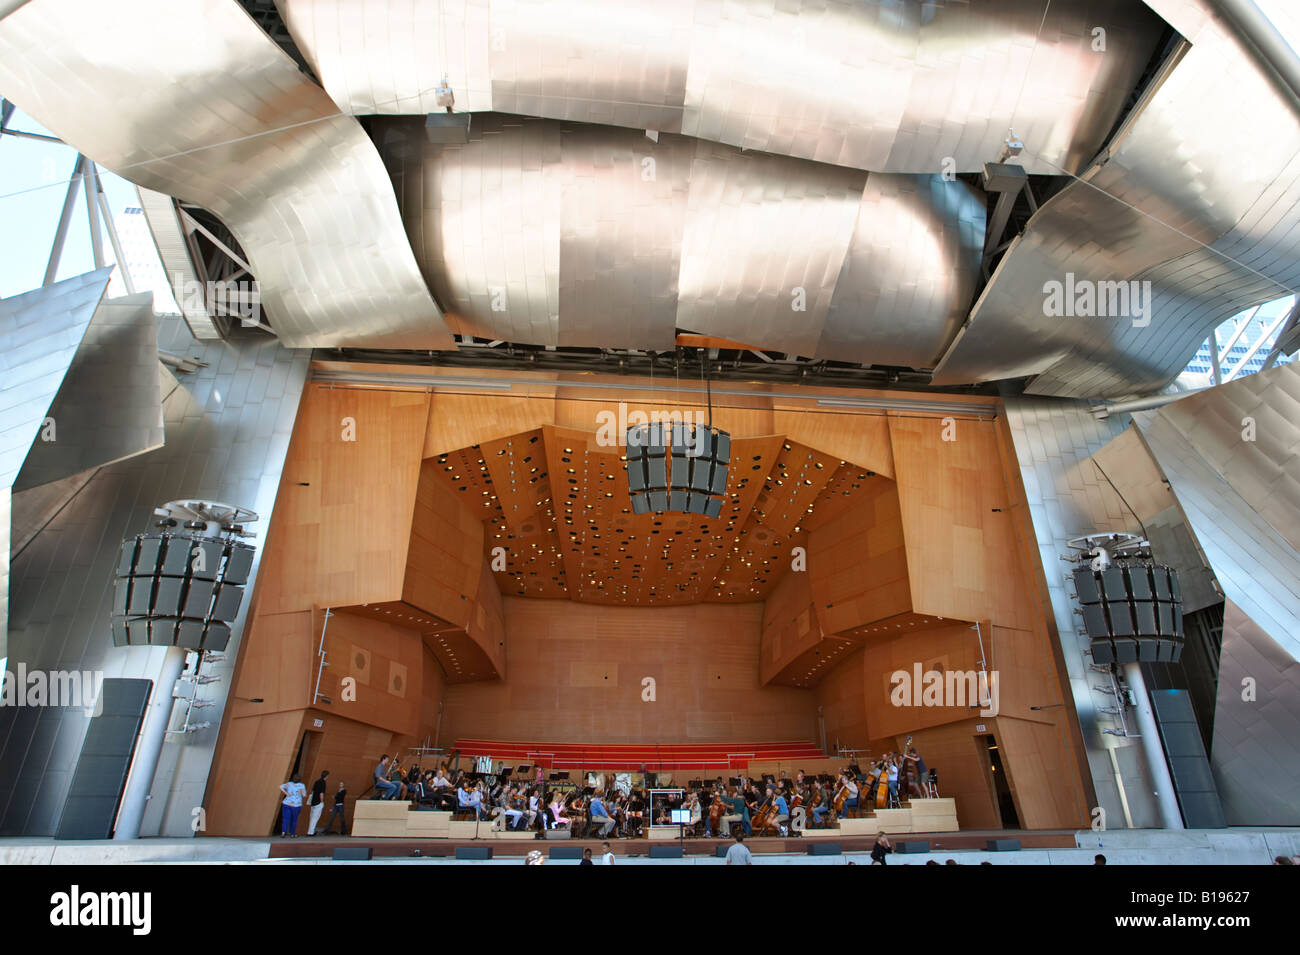 ILLINOIS Chicago Pritzker Pavilion modern architecture Frank Gehry curving steel panels Millennium Park stage - Stock Image